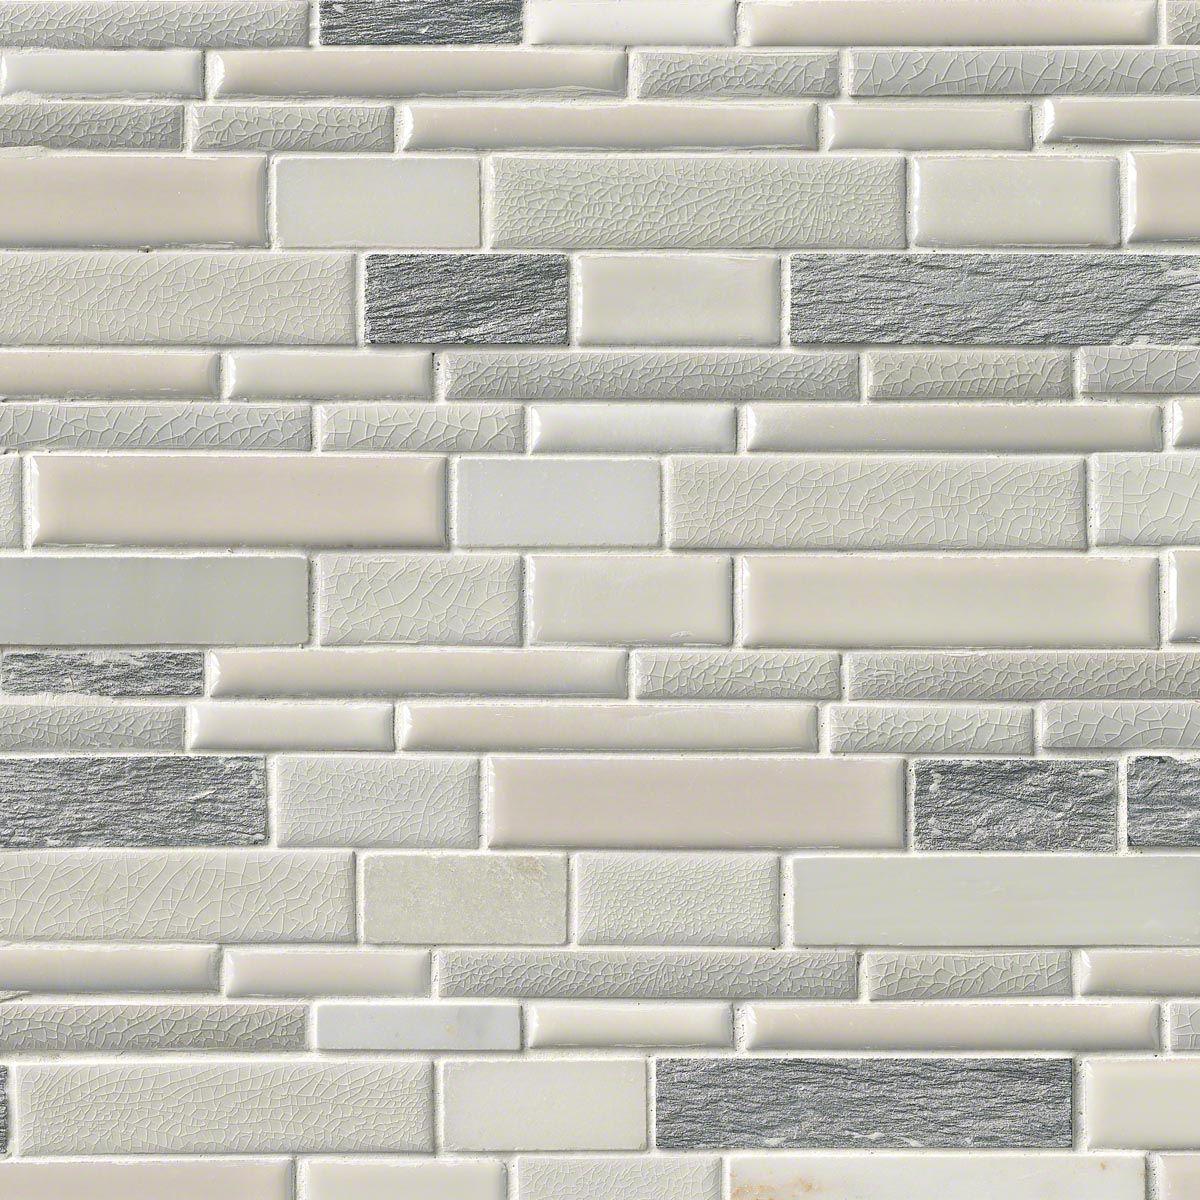 Everest interlocking pattern 8 mm backsplash wall tile tile everest interlocking pattern 8 mm backsplash wall tile dailygadgetfo Images